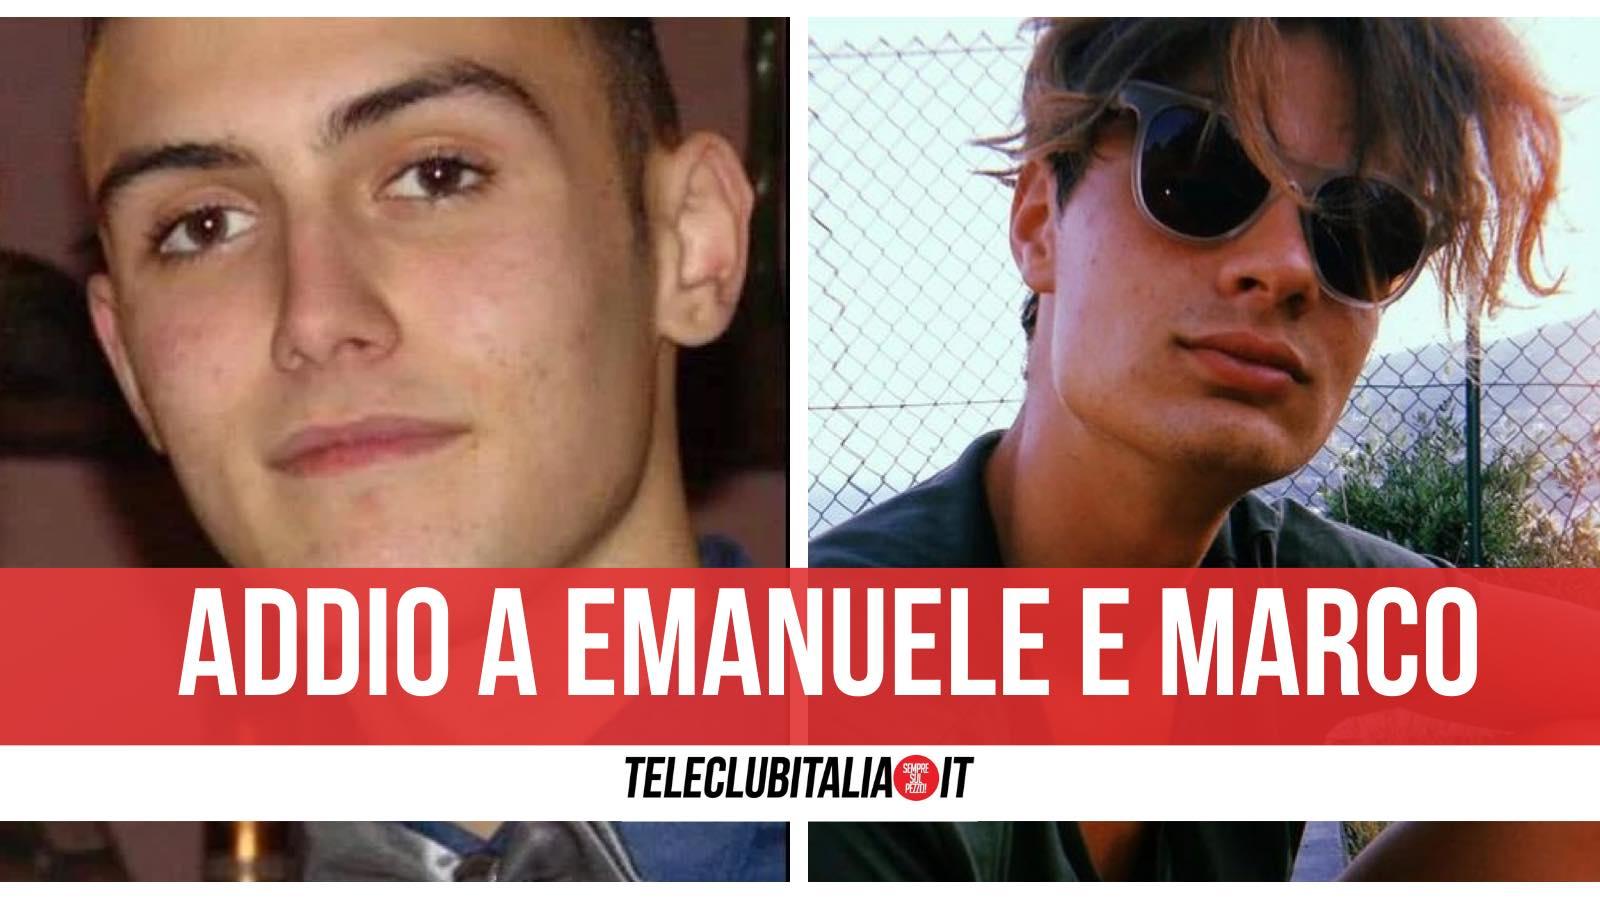 incidente aurelia morti due giovani emanuele albanto marco parascosso